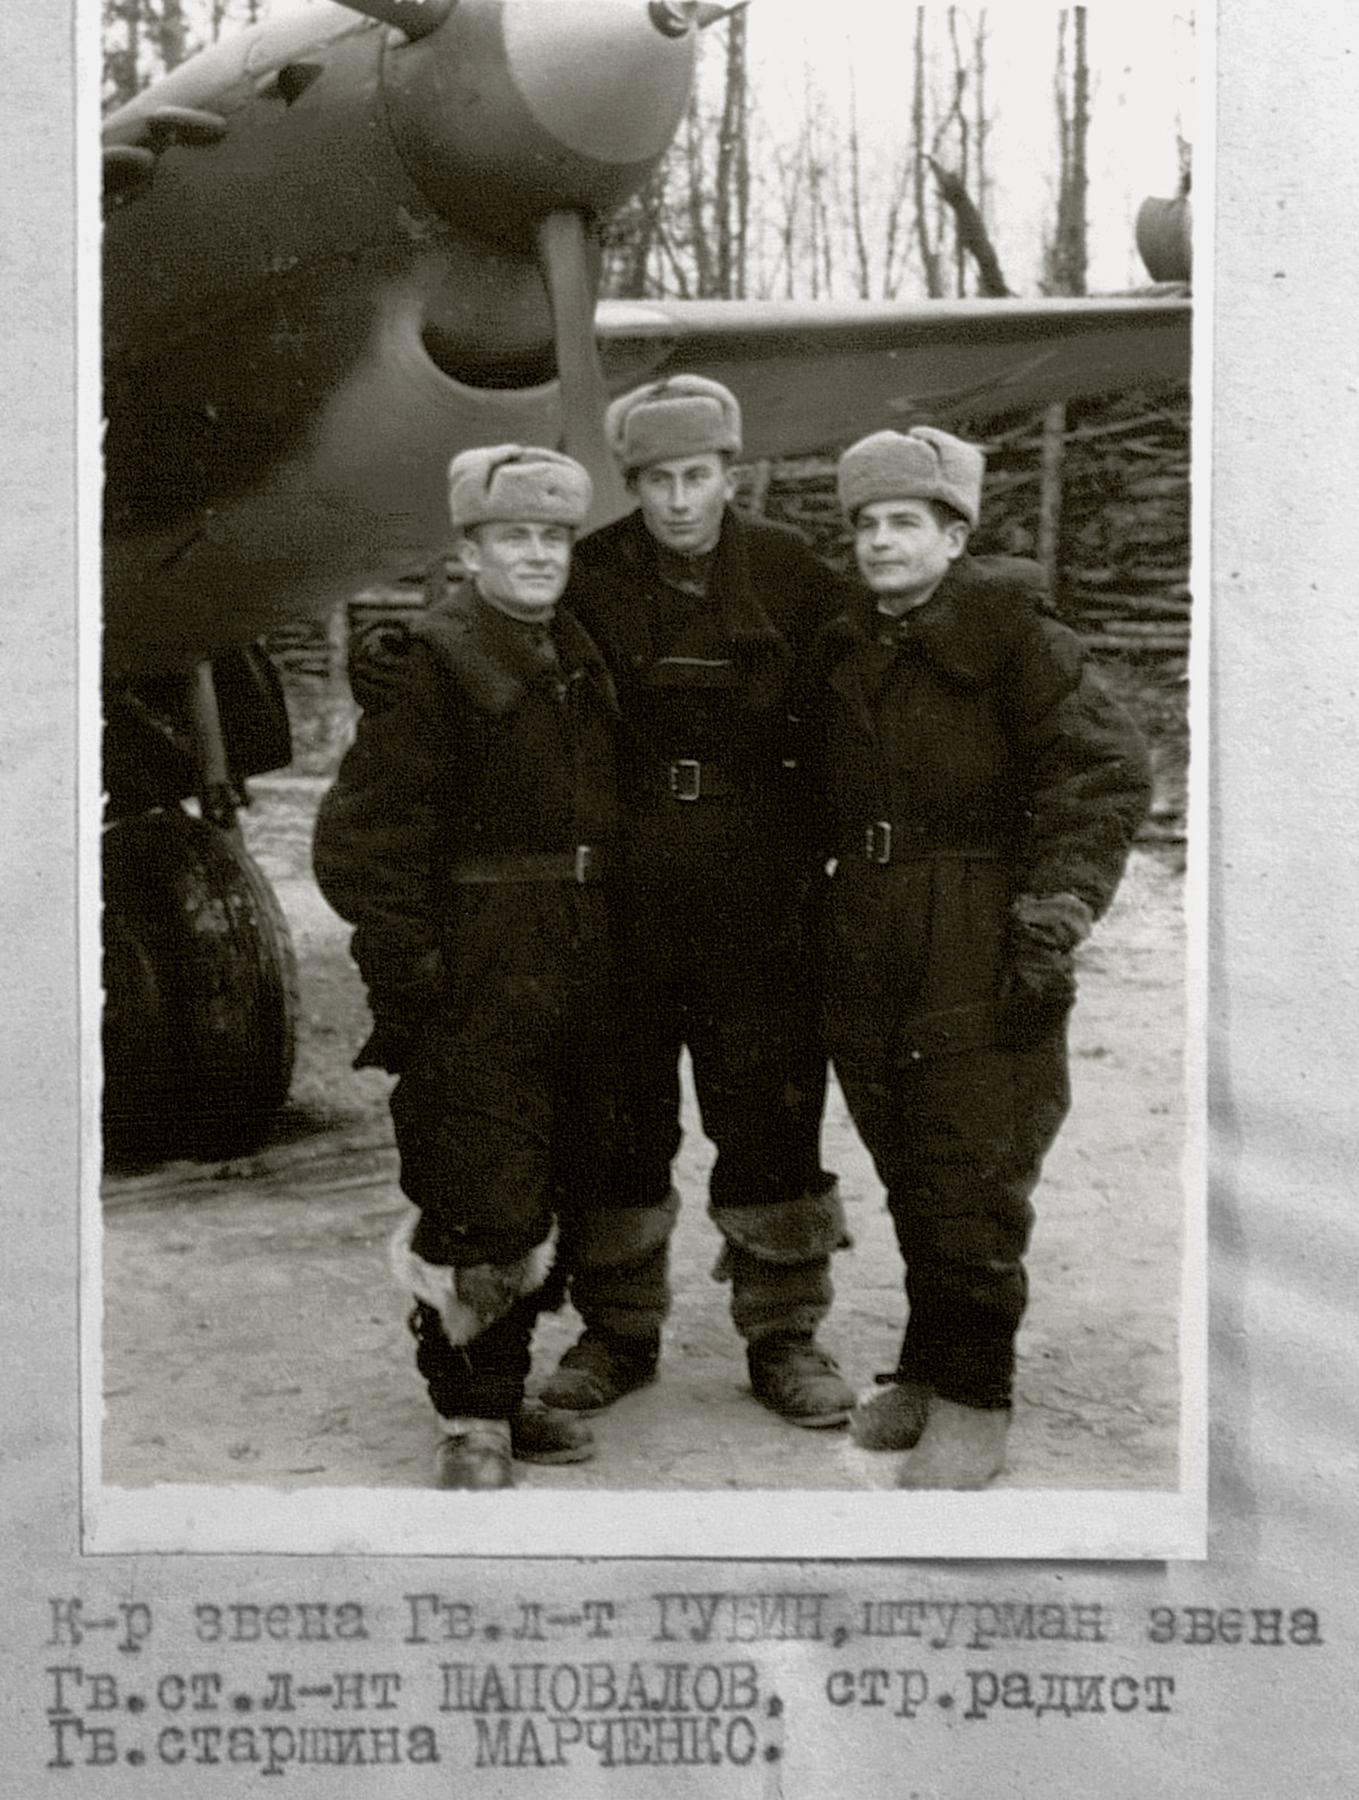 Aircrew Soviet 81GvBAP with crew Gubin,Shapovalov and Markov 1943 01